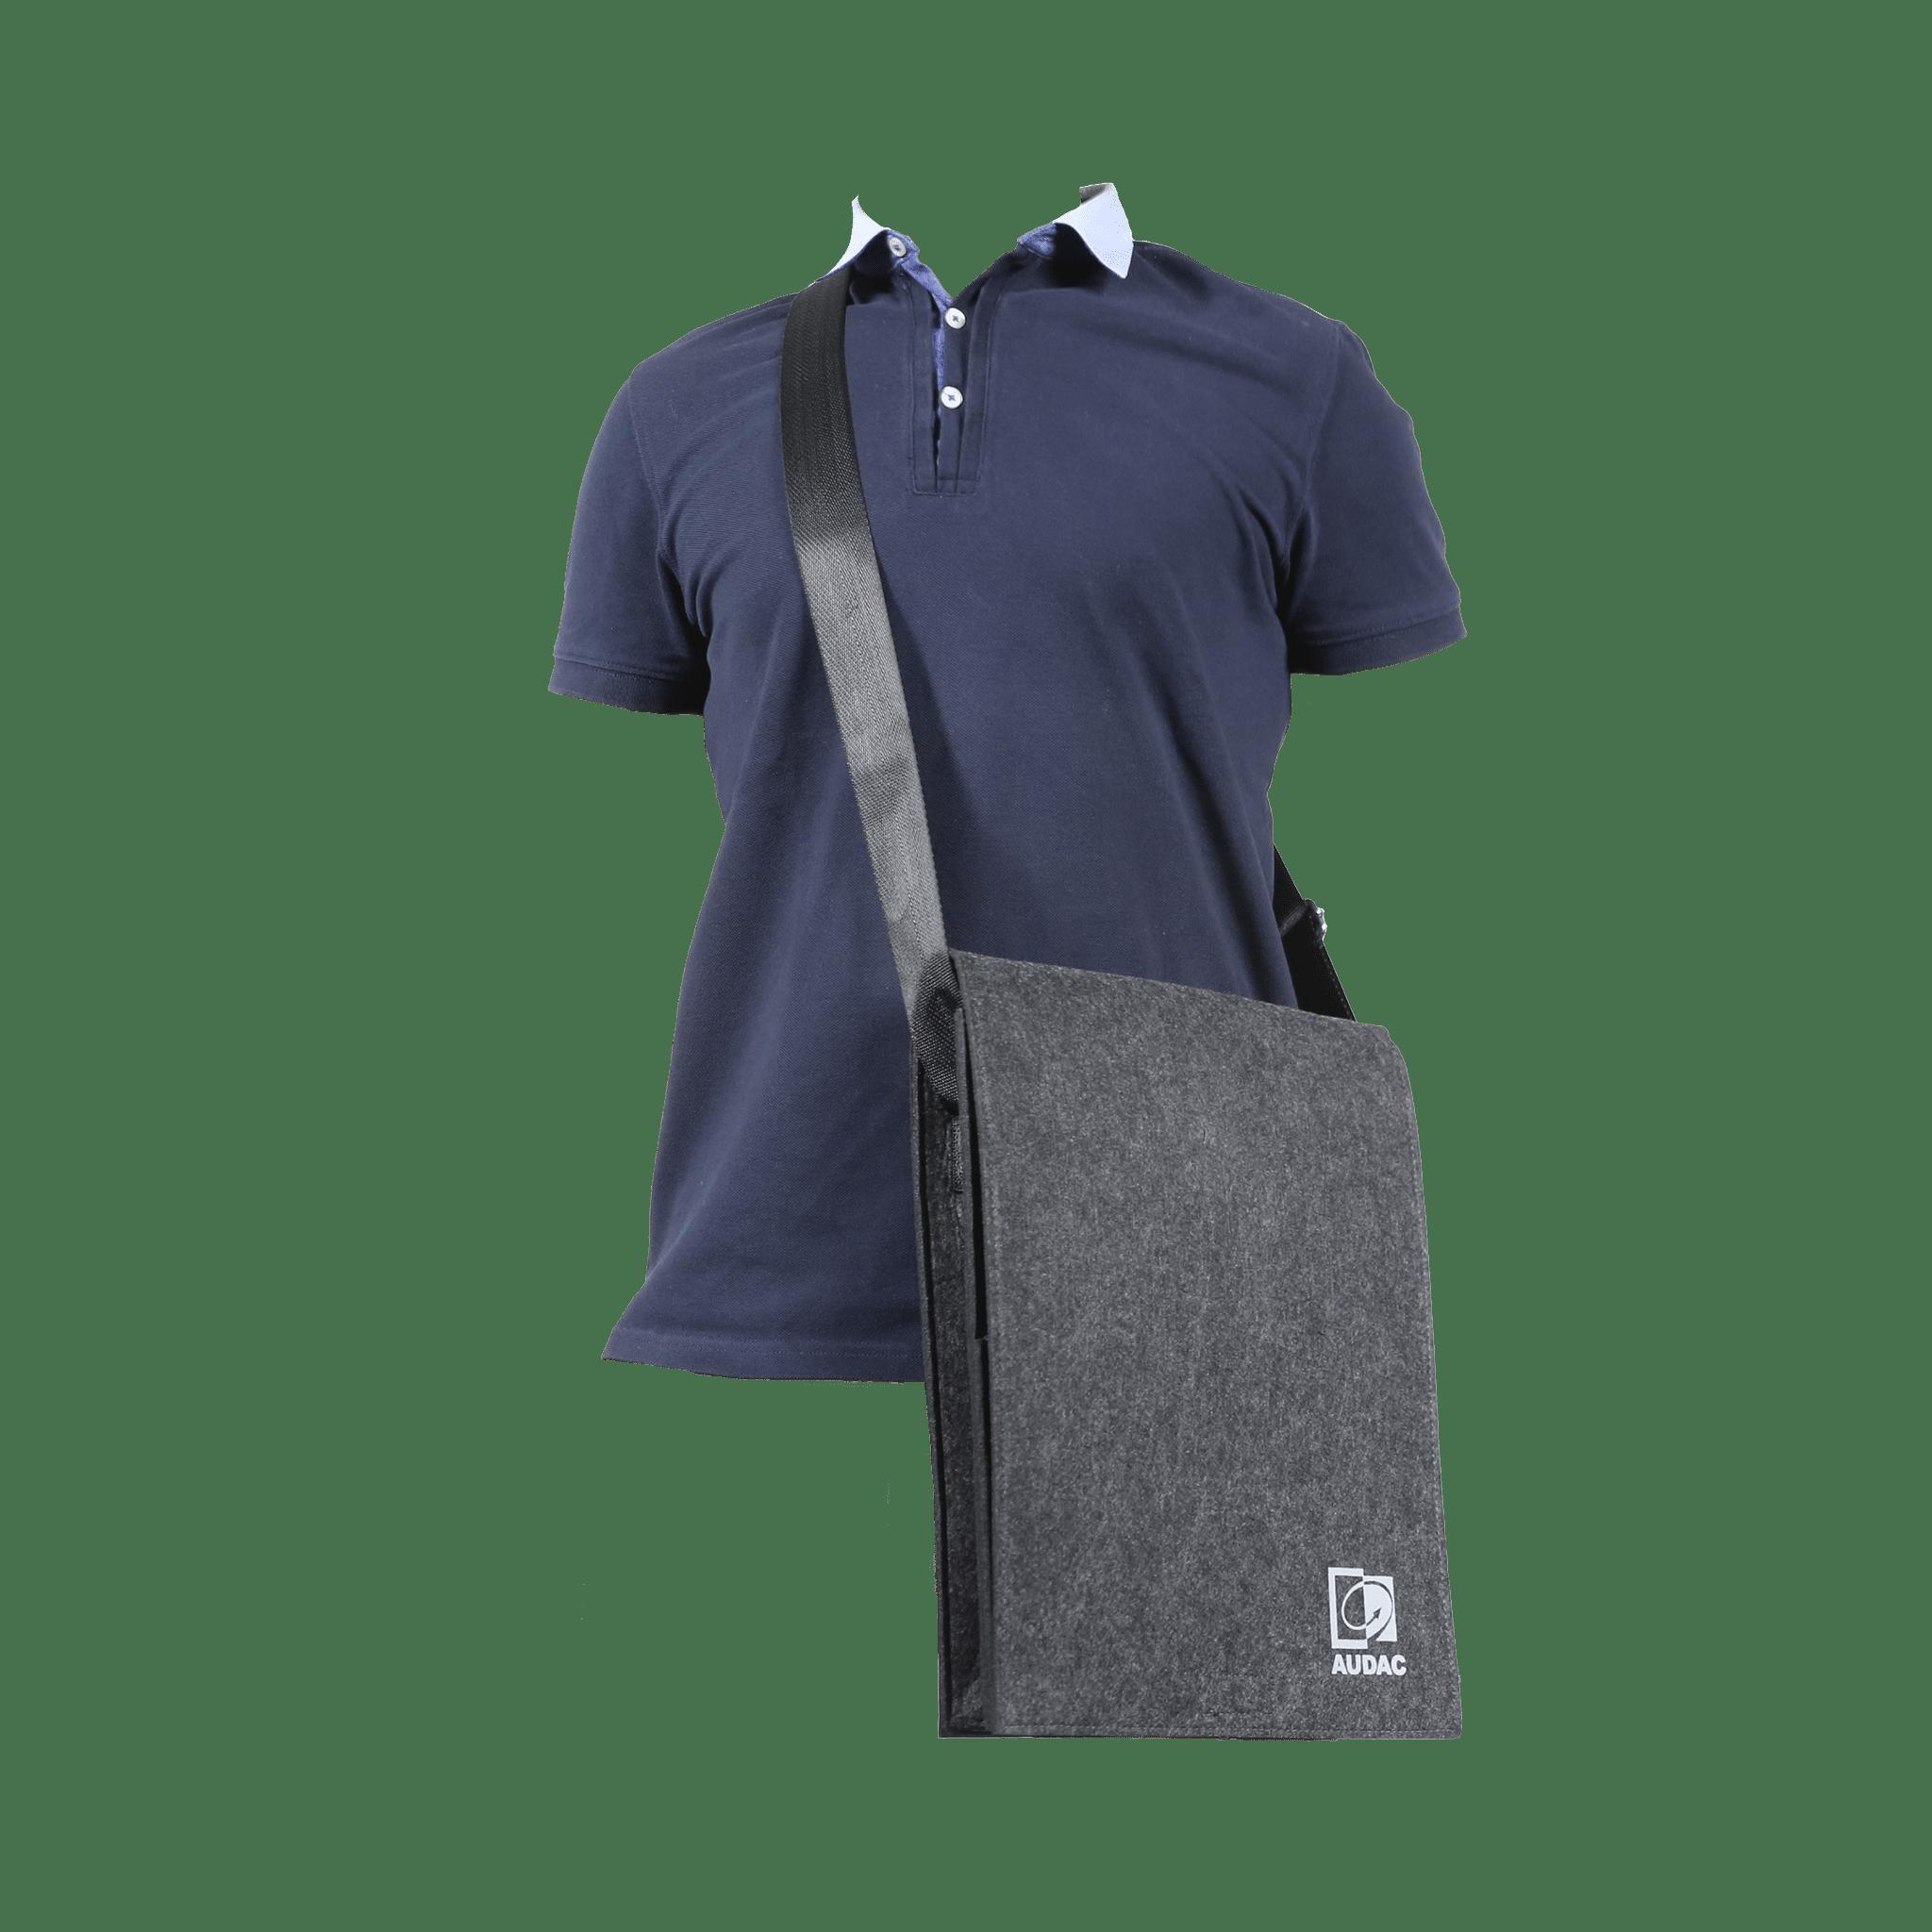 PROMO5131 - Felt AUDAC promotion bag